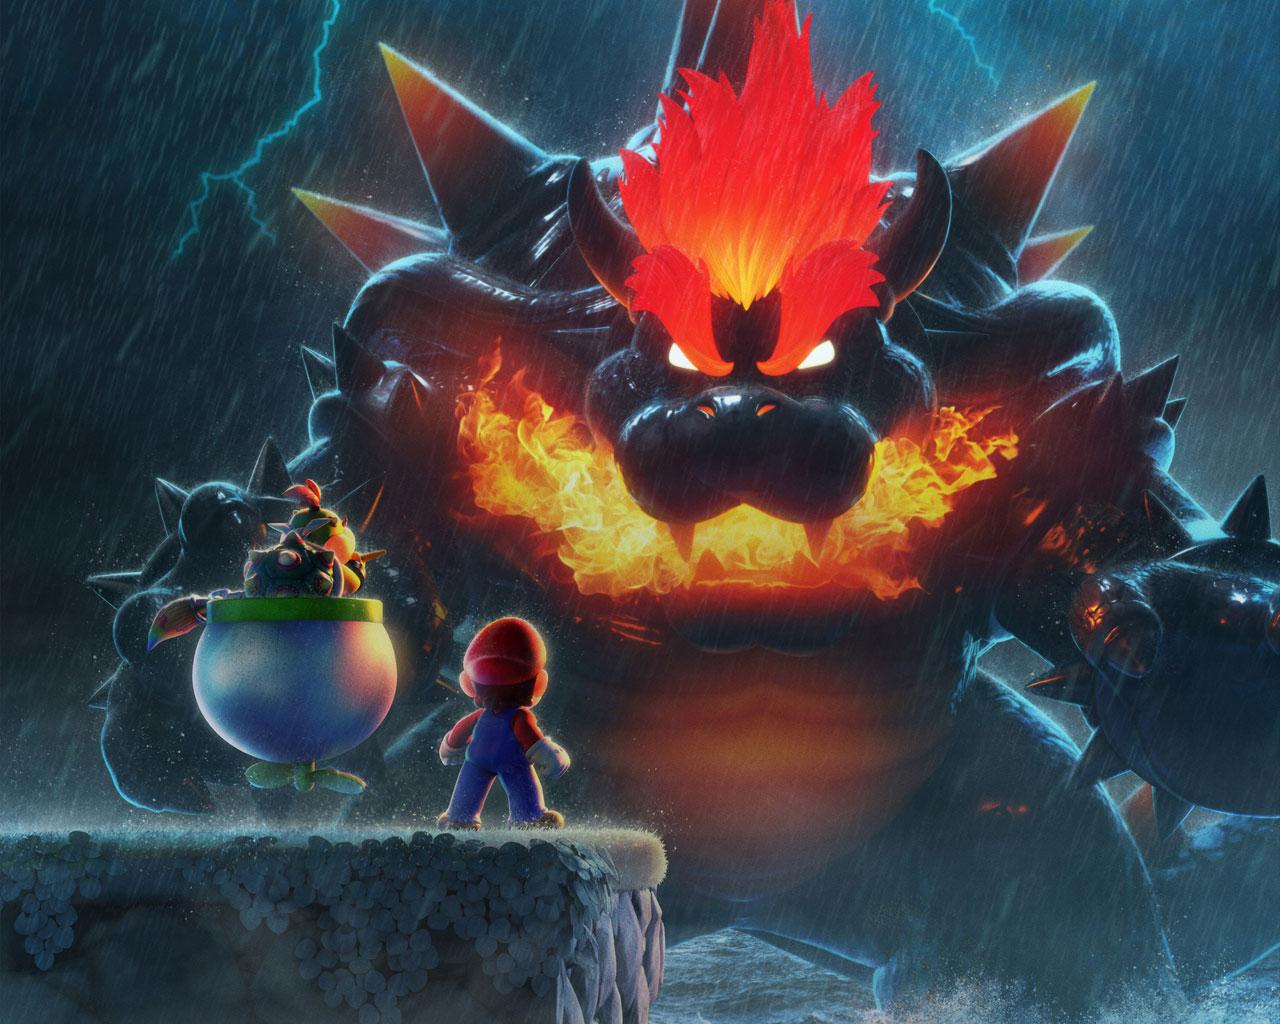 Free Super Mario 3D World Wallpaper in 1280x1024